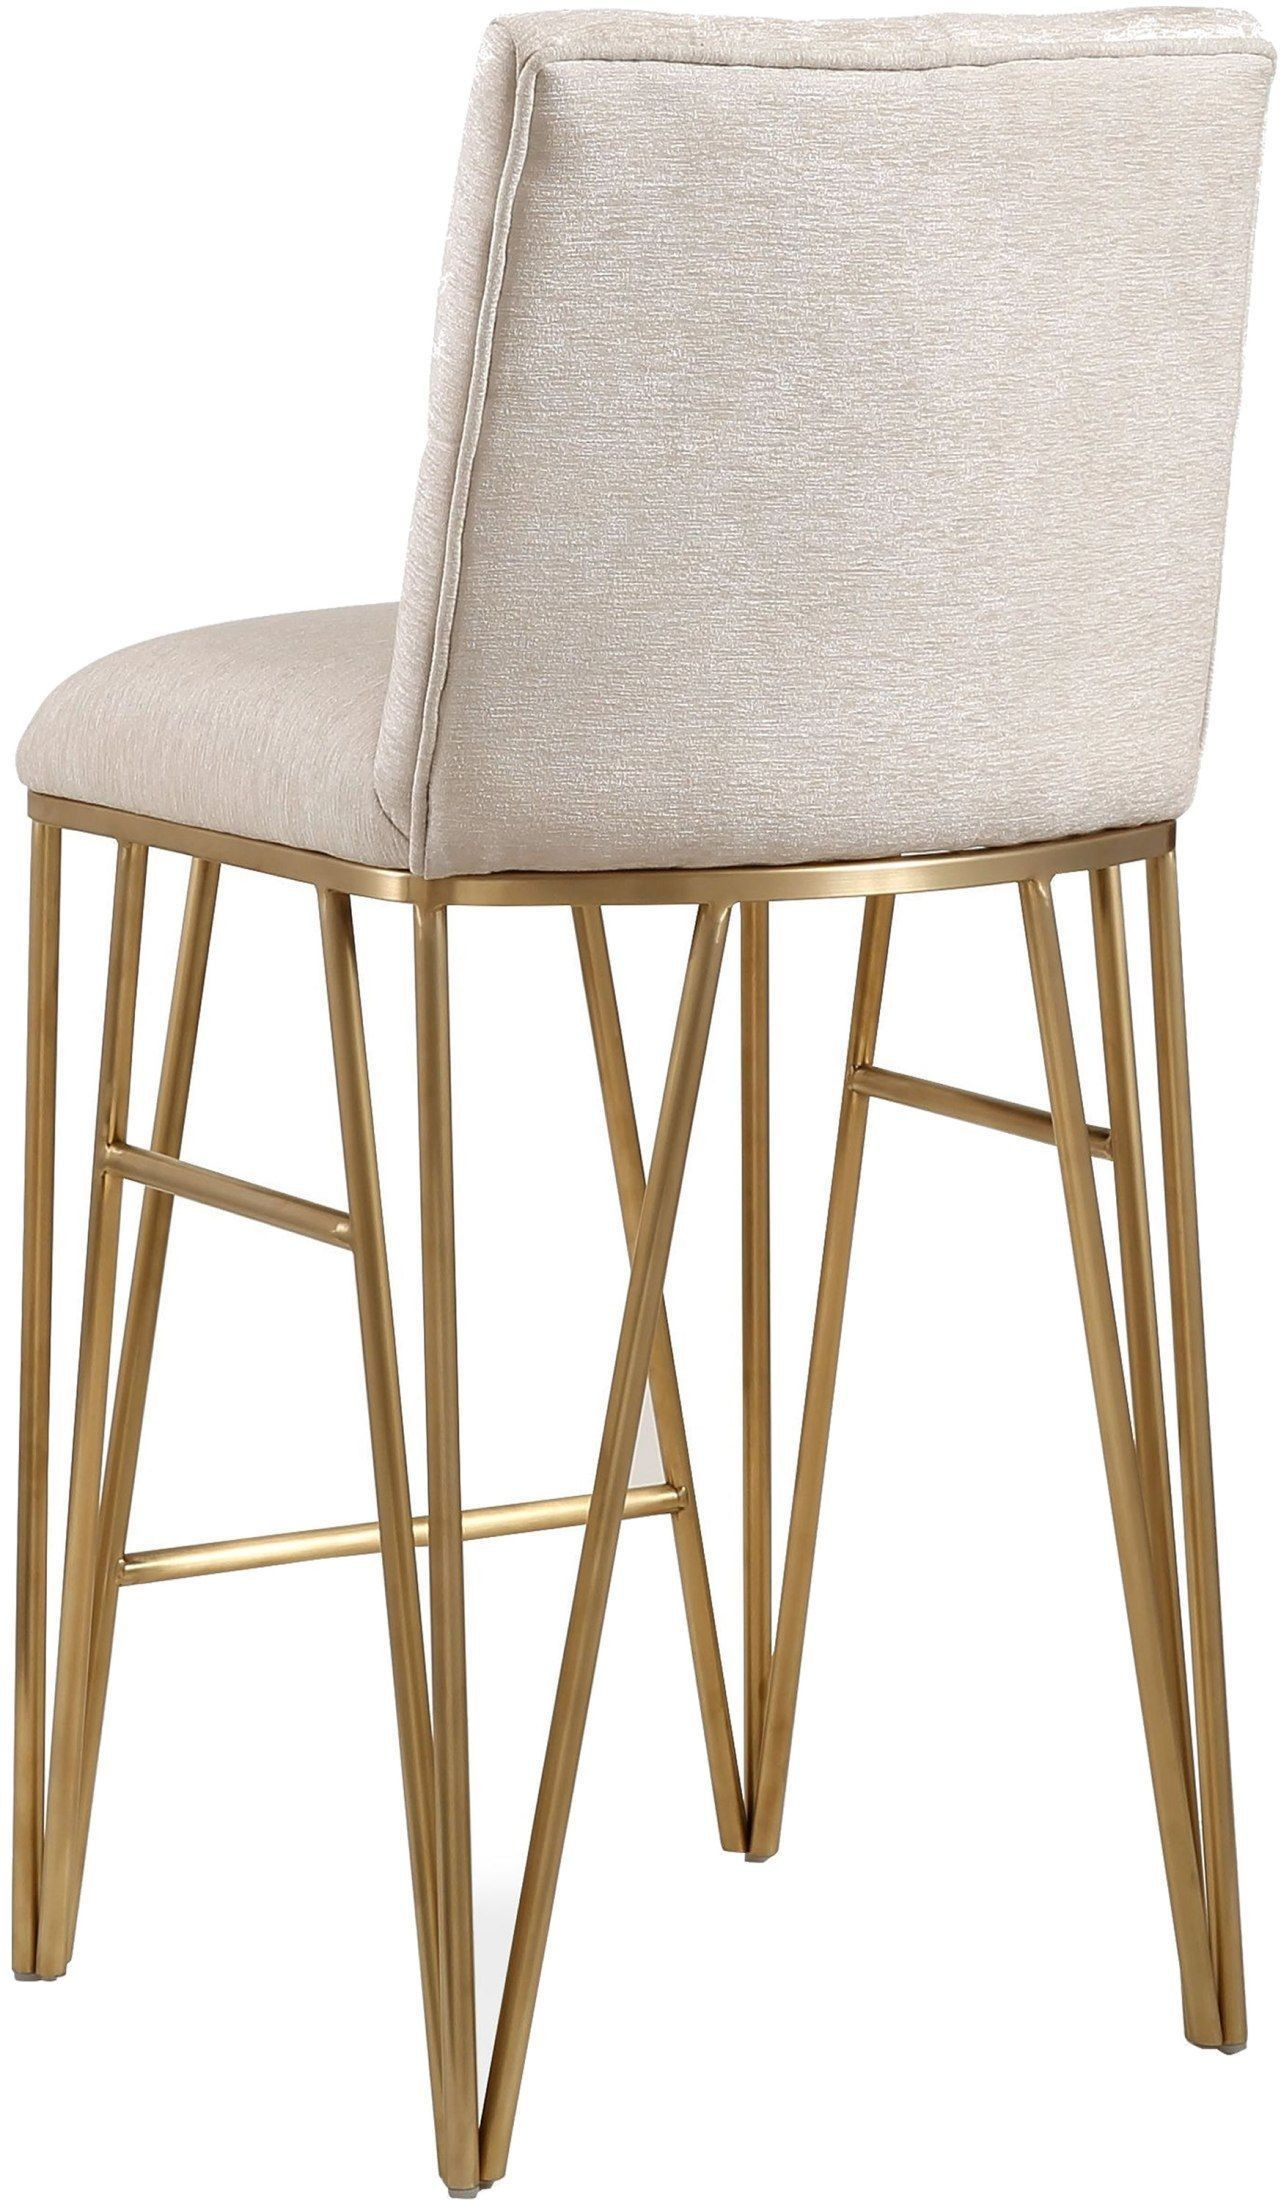 Lexi Cream Textured Velvet Bar Stool D3730 TOV Furniture : tov d37303tov from colemanfurniture.com size 1281 x 2200 jpeg 435kB